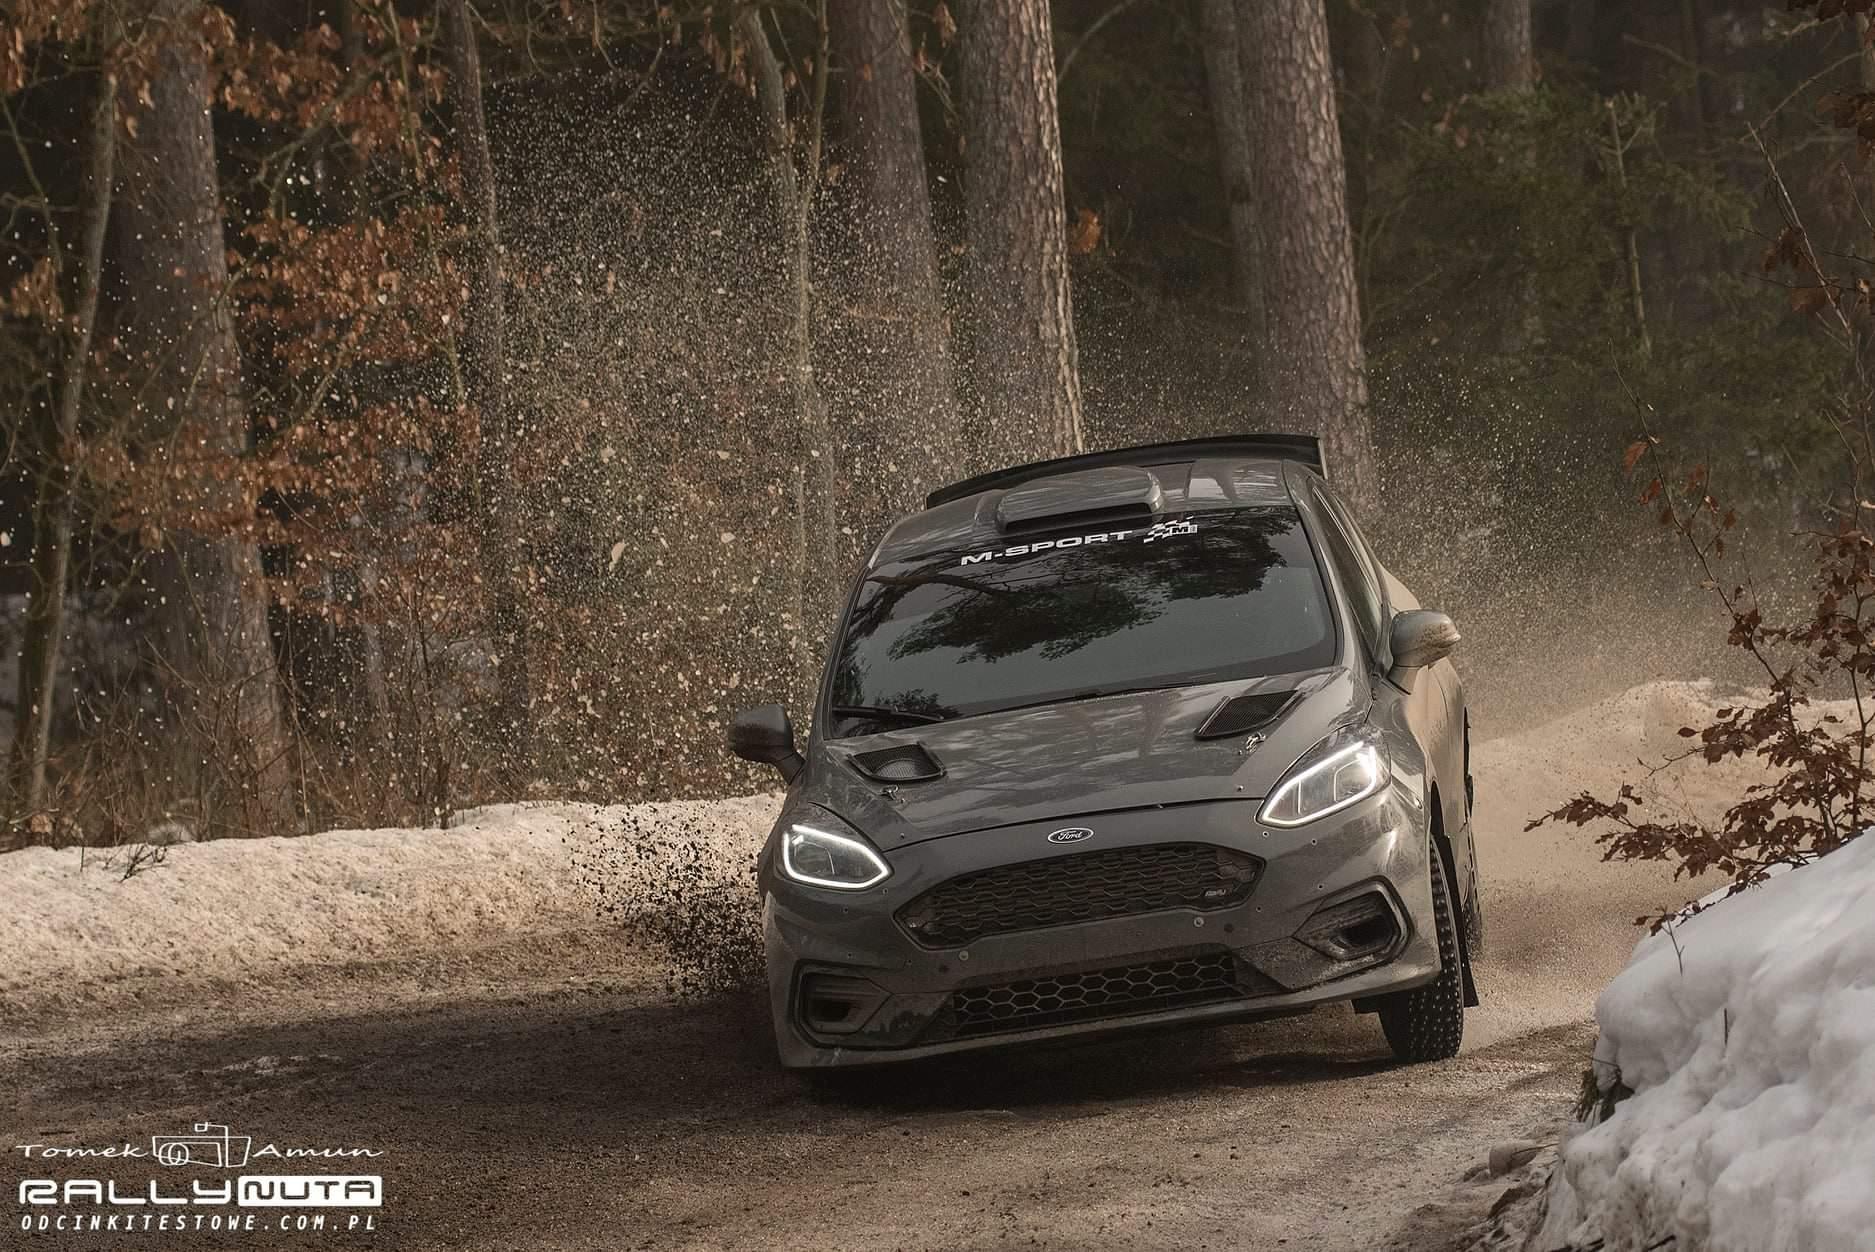 FIA European Rally Championship: Temporada 2021 - Página 3 Eu8GSCXXAAM2ixw?format=jpg&name=large